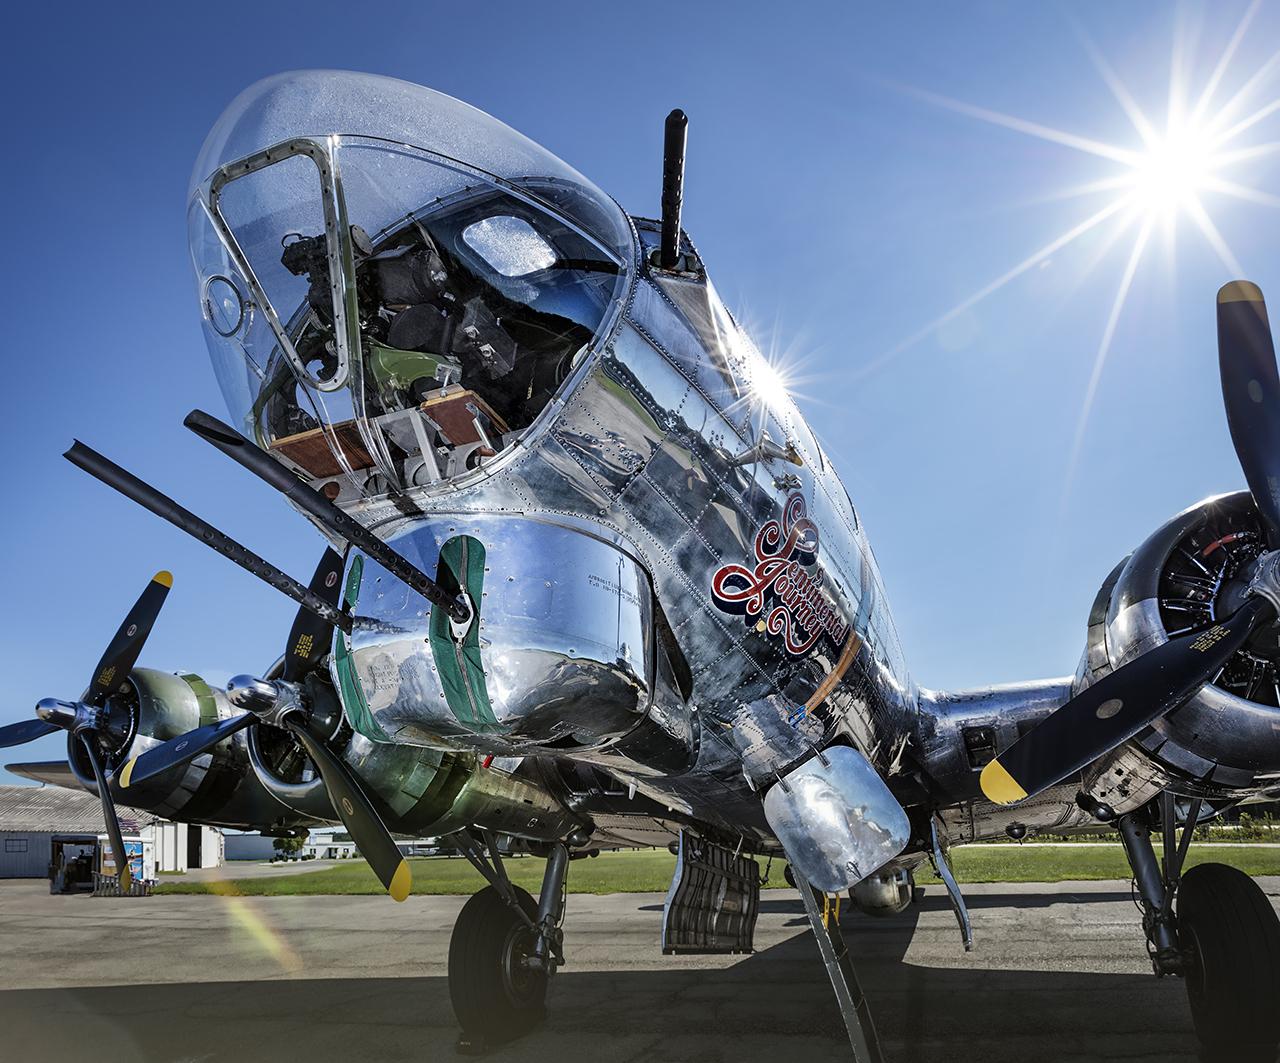 IMAGE: http://markfingar.com/photogallery/Aircraft/7-28-17/B17_SJ_nose-lr.jpg